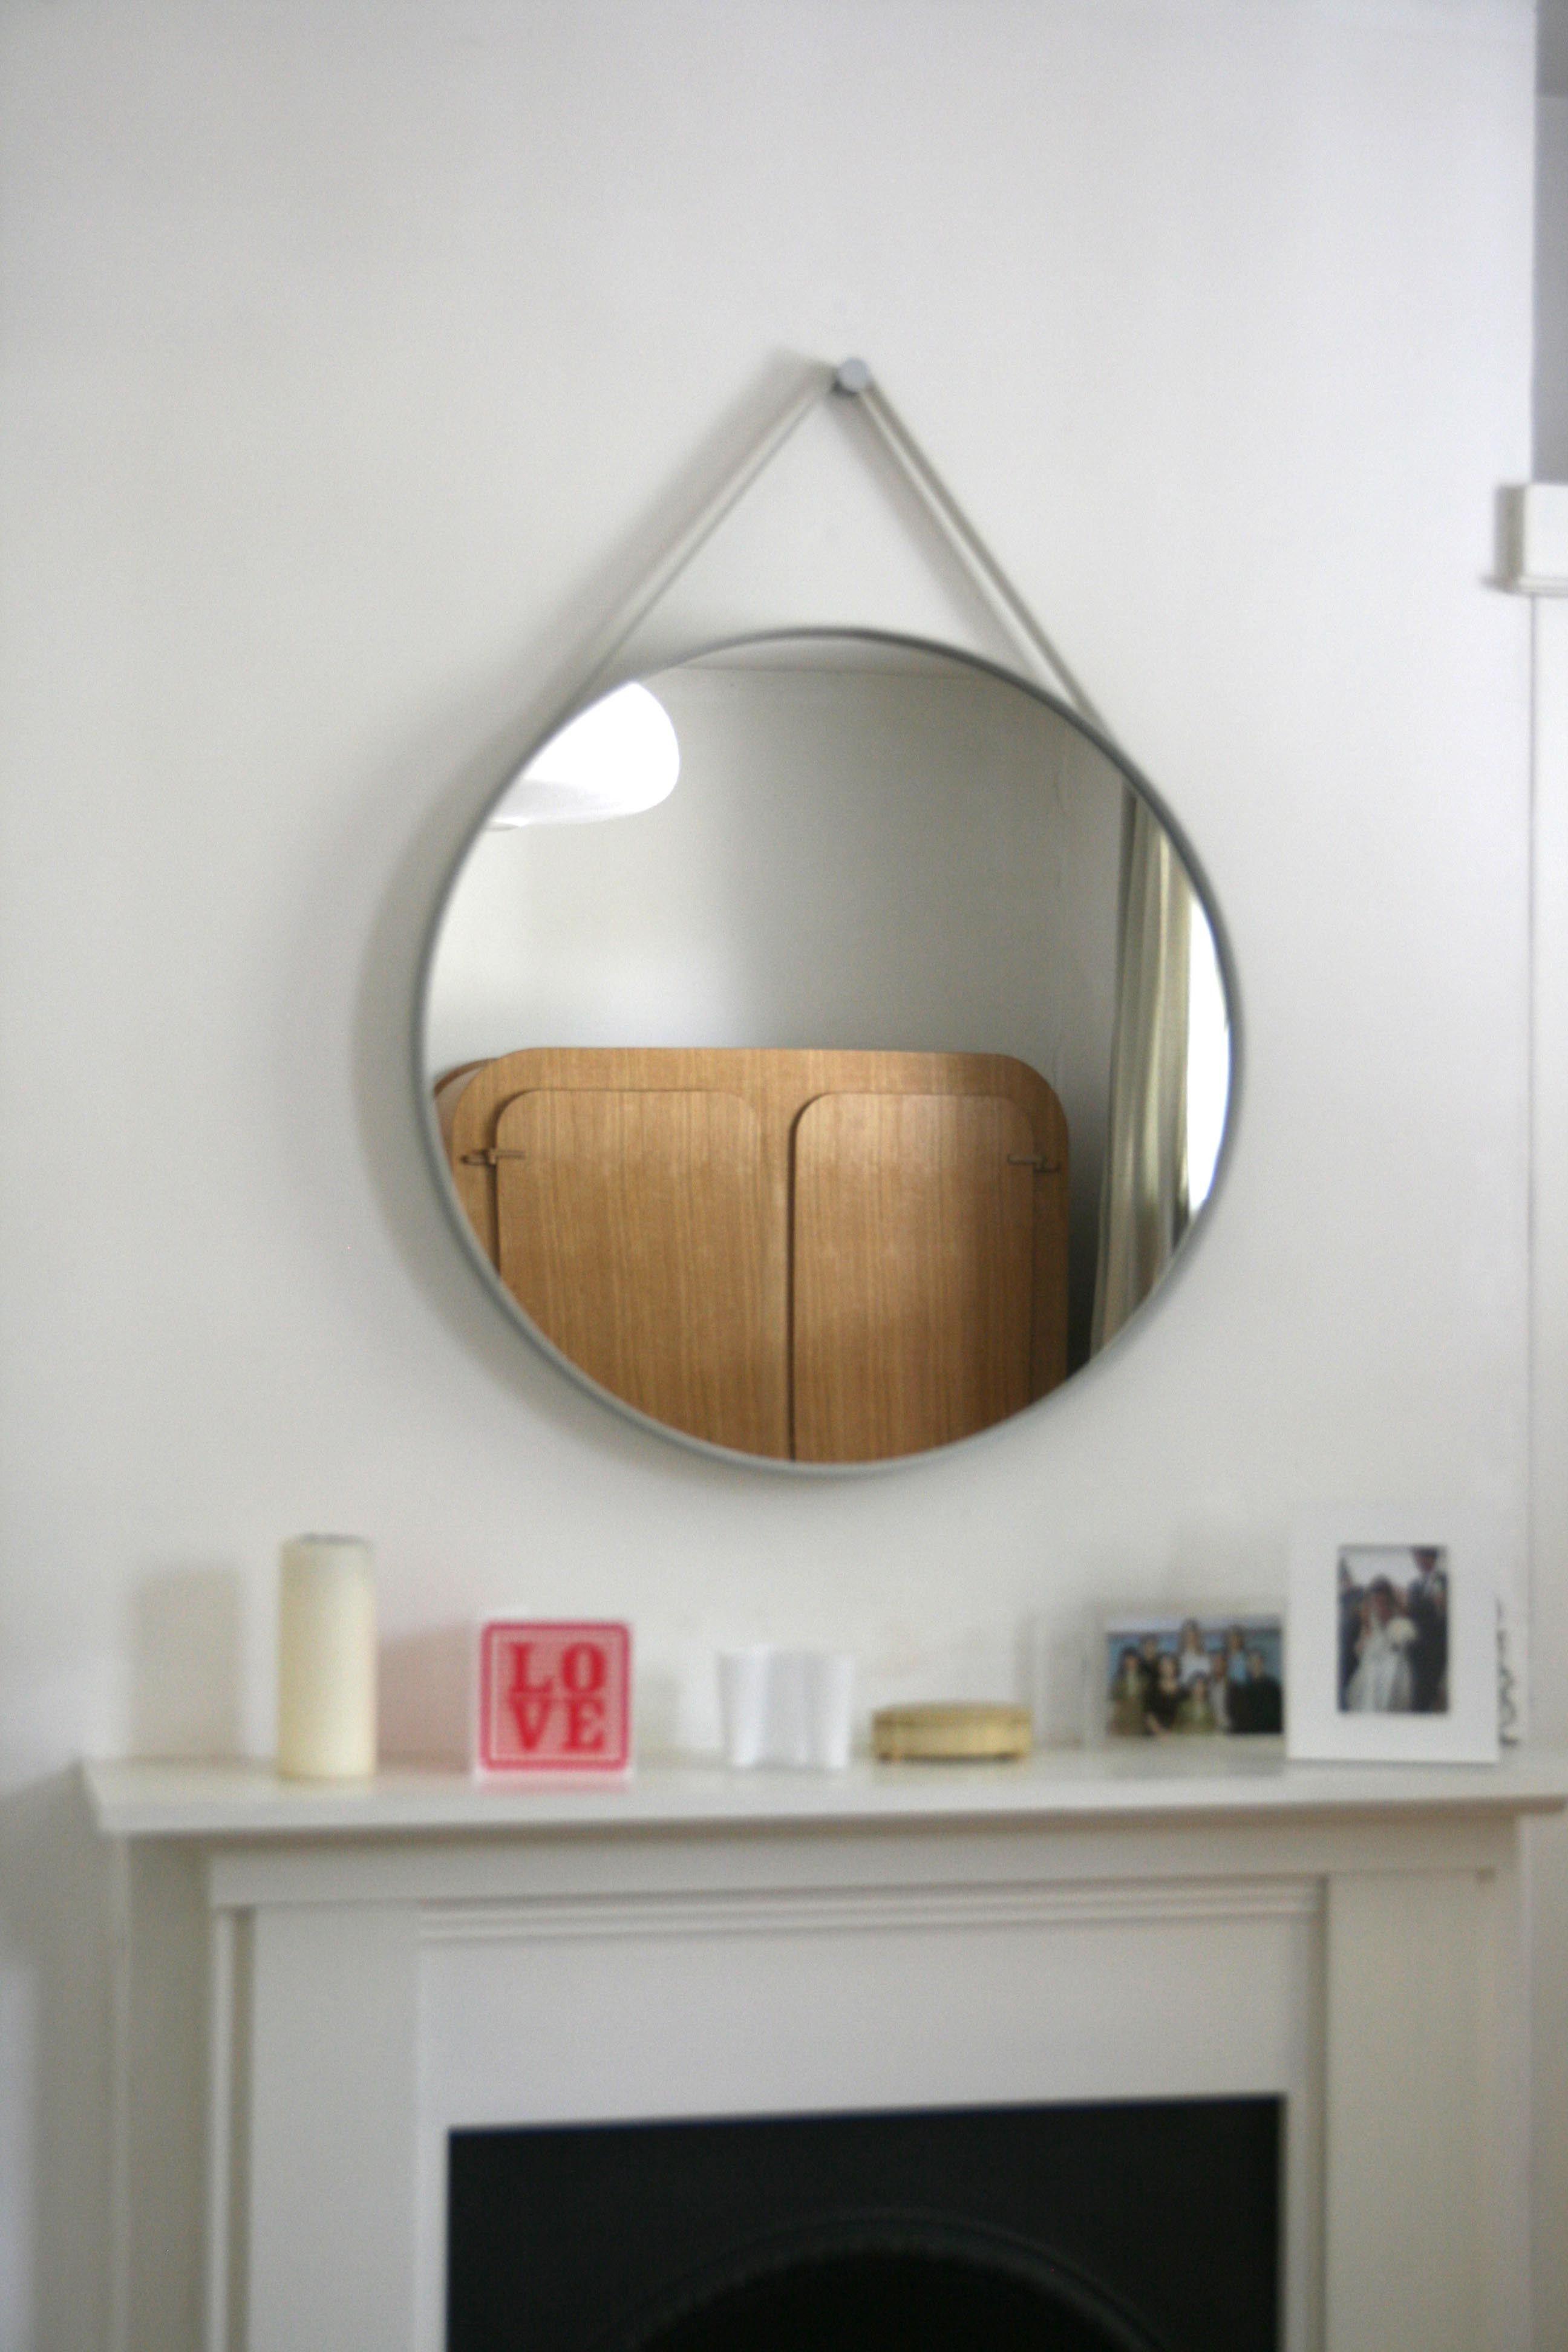 Hay Strap Mirror 70Cm V A Httpthatdesignstorecoukhay Strap Mirrorhtm